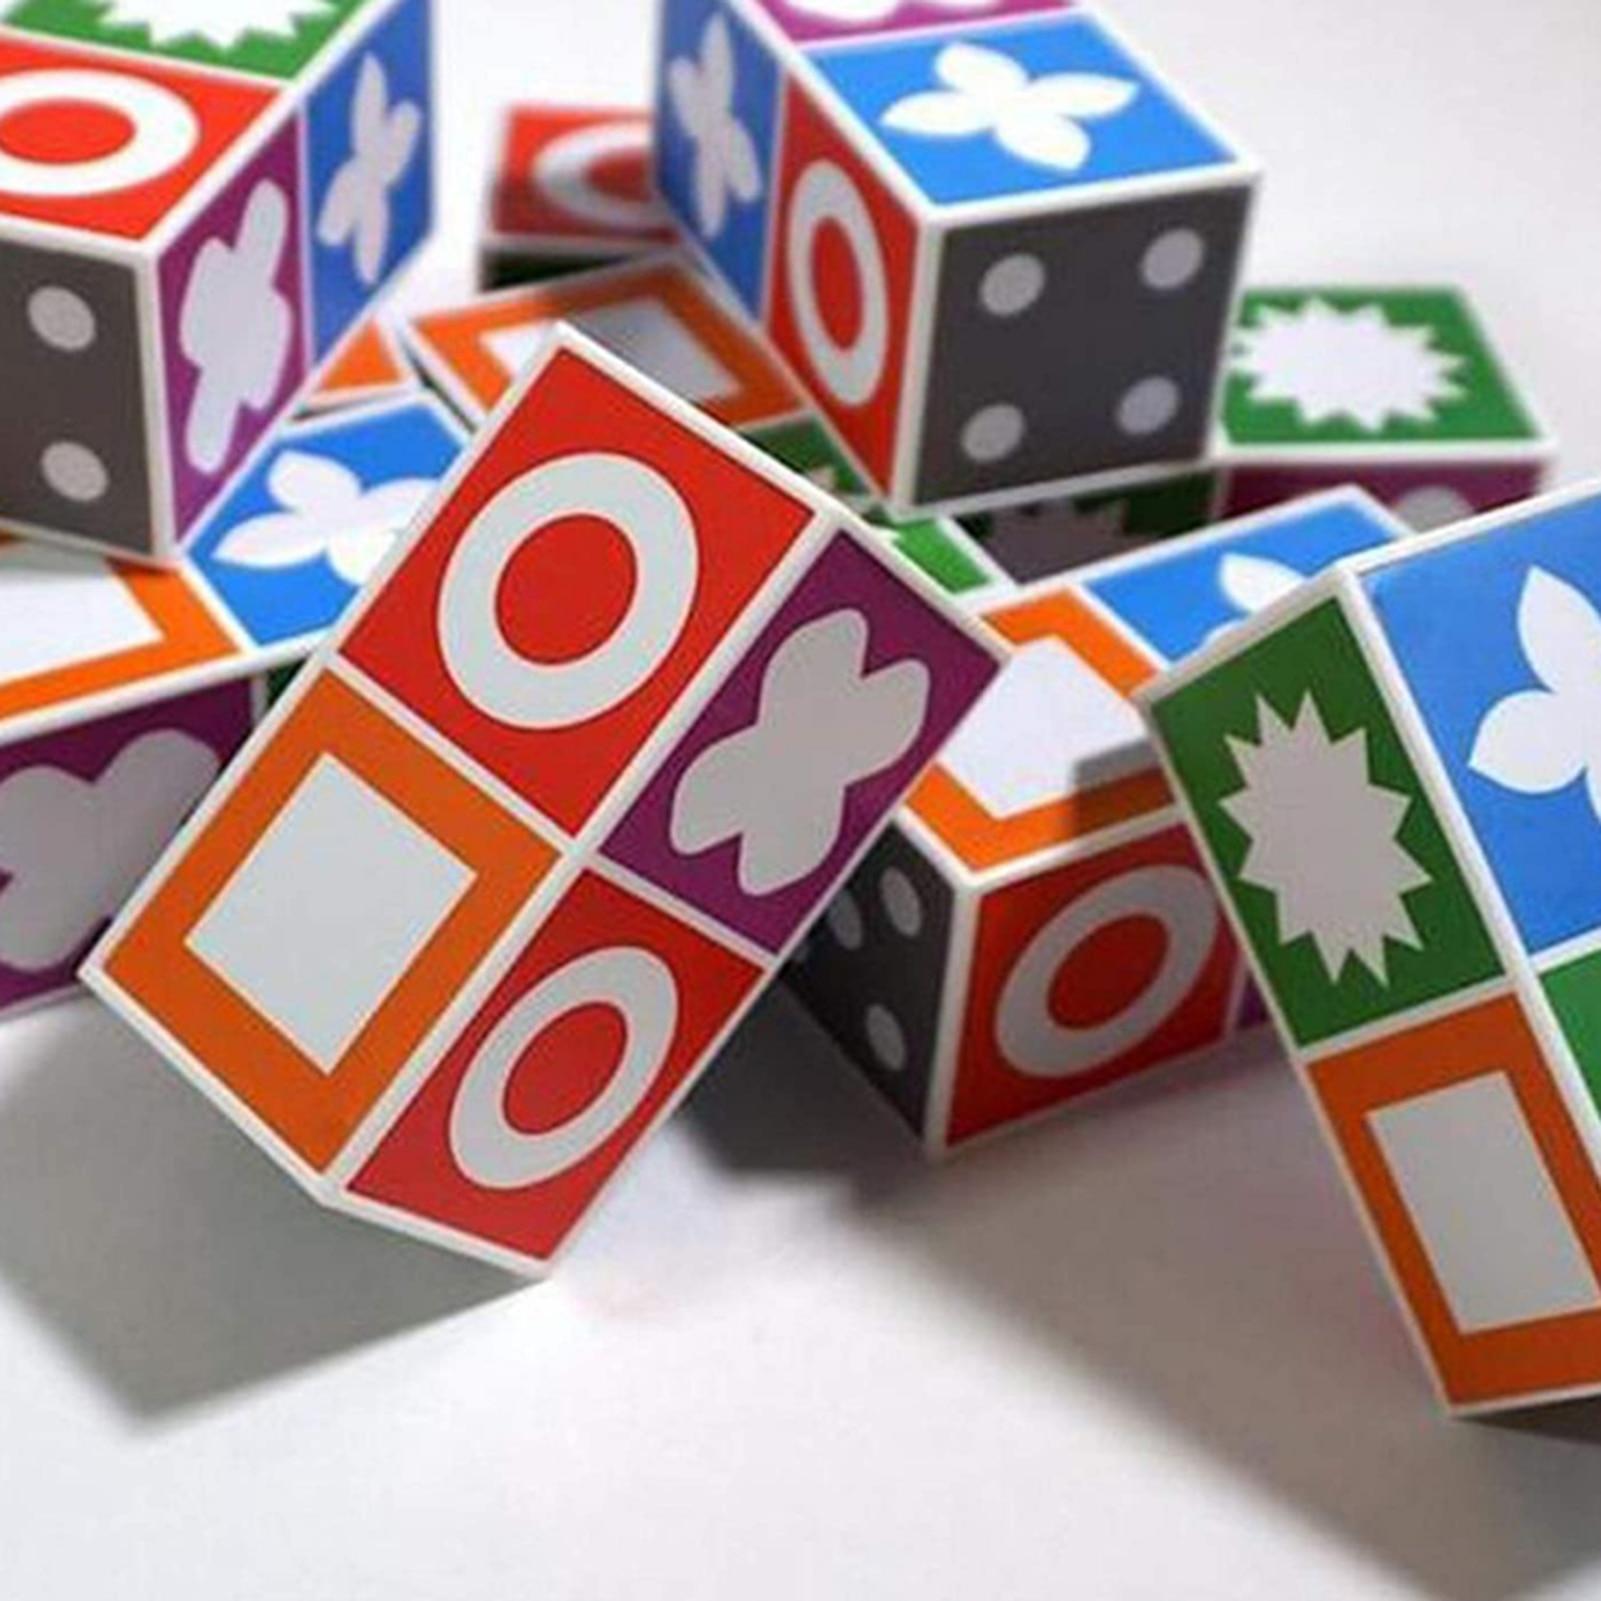 0-Match-Madness-Board-Game-Match-Master-Children-Intelligence-Development-Toy-Kit-Wooden-Toys-Multip